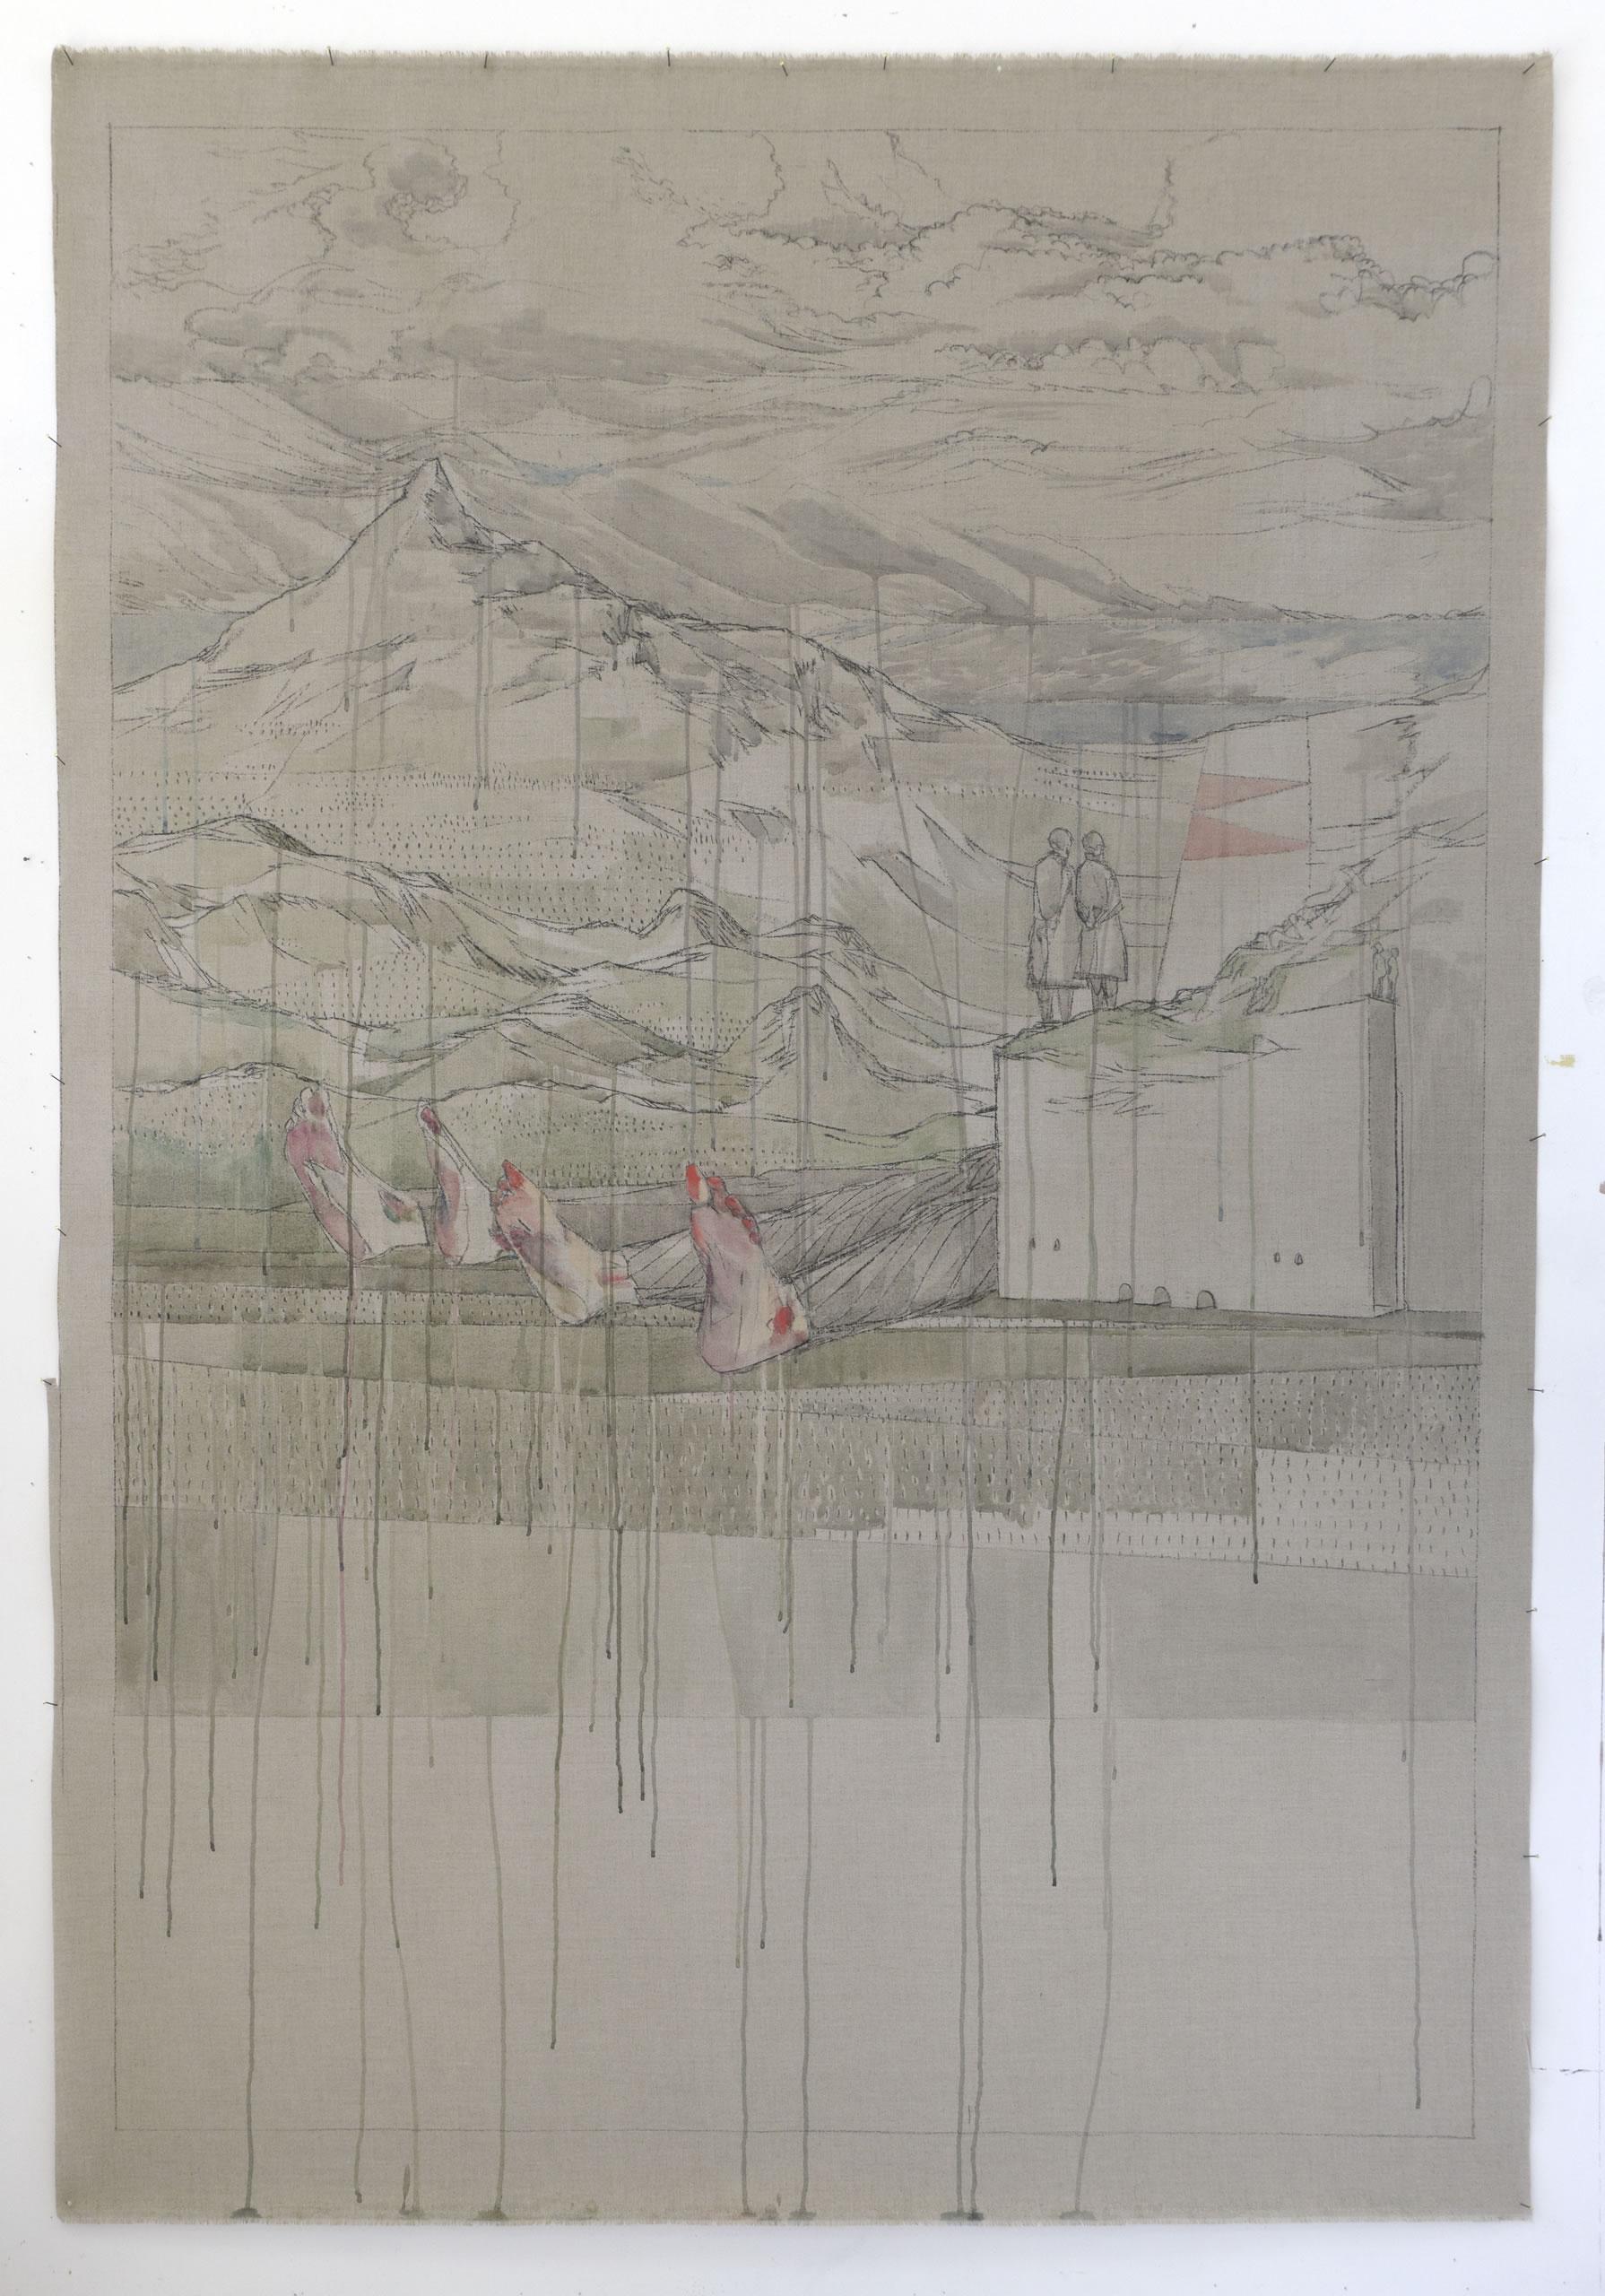 Maria Legat >Ende gut< | 12 | BergWerk | Galerie3 | Flux23